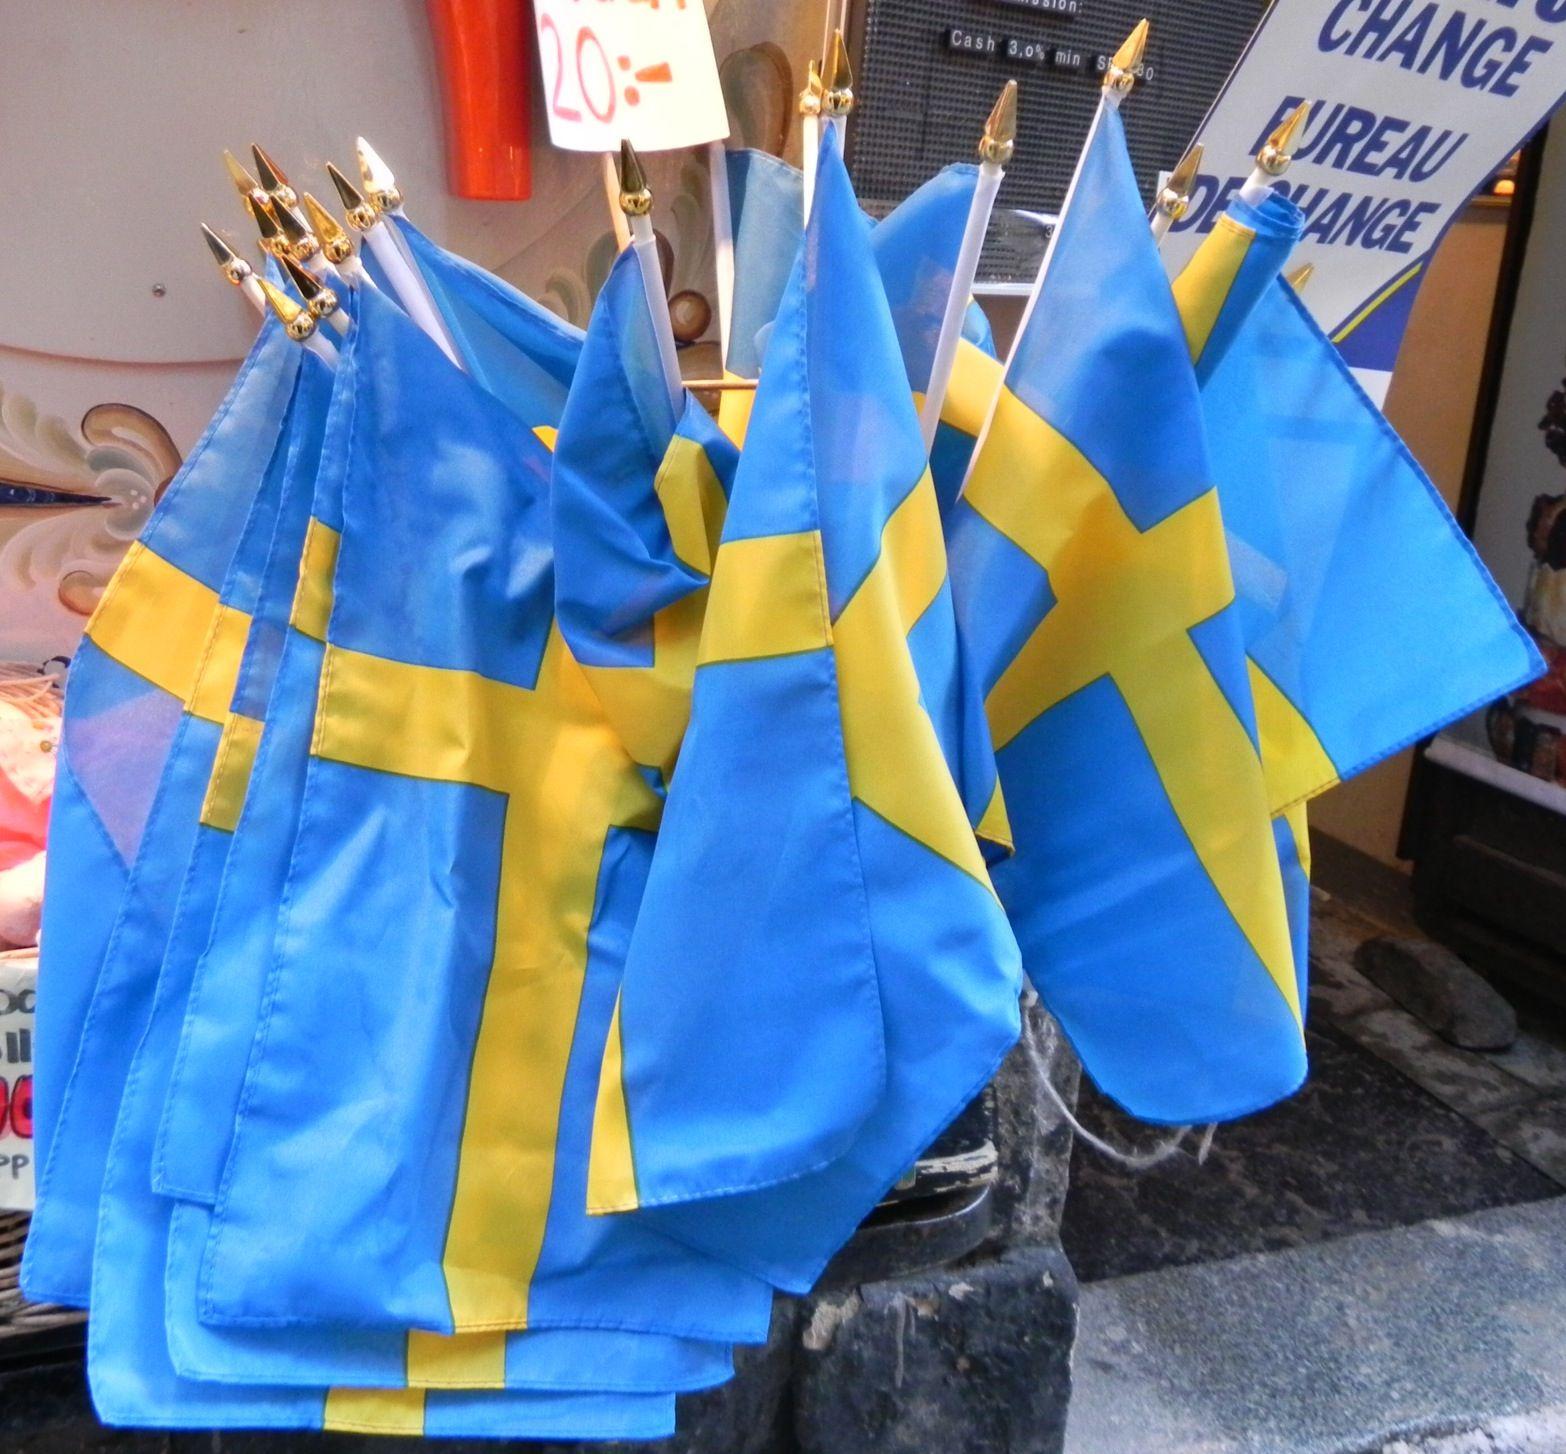 Swedish Flags For Sale Stockholm Sweden Photo By Pgrbydand Flag Flags For Sale Swedish Flag